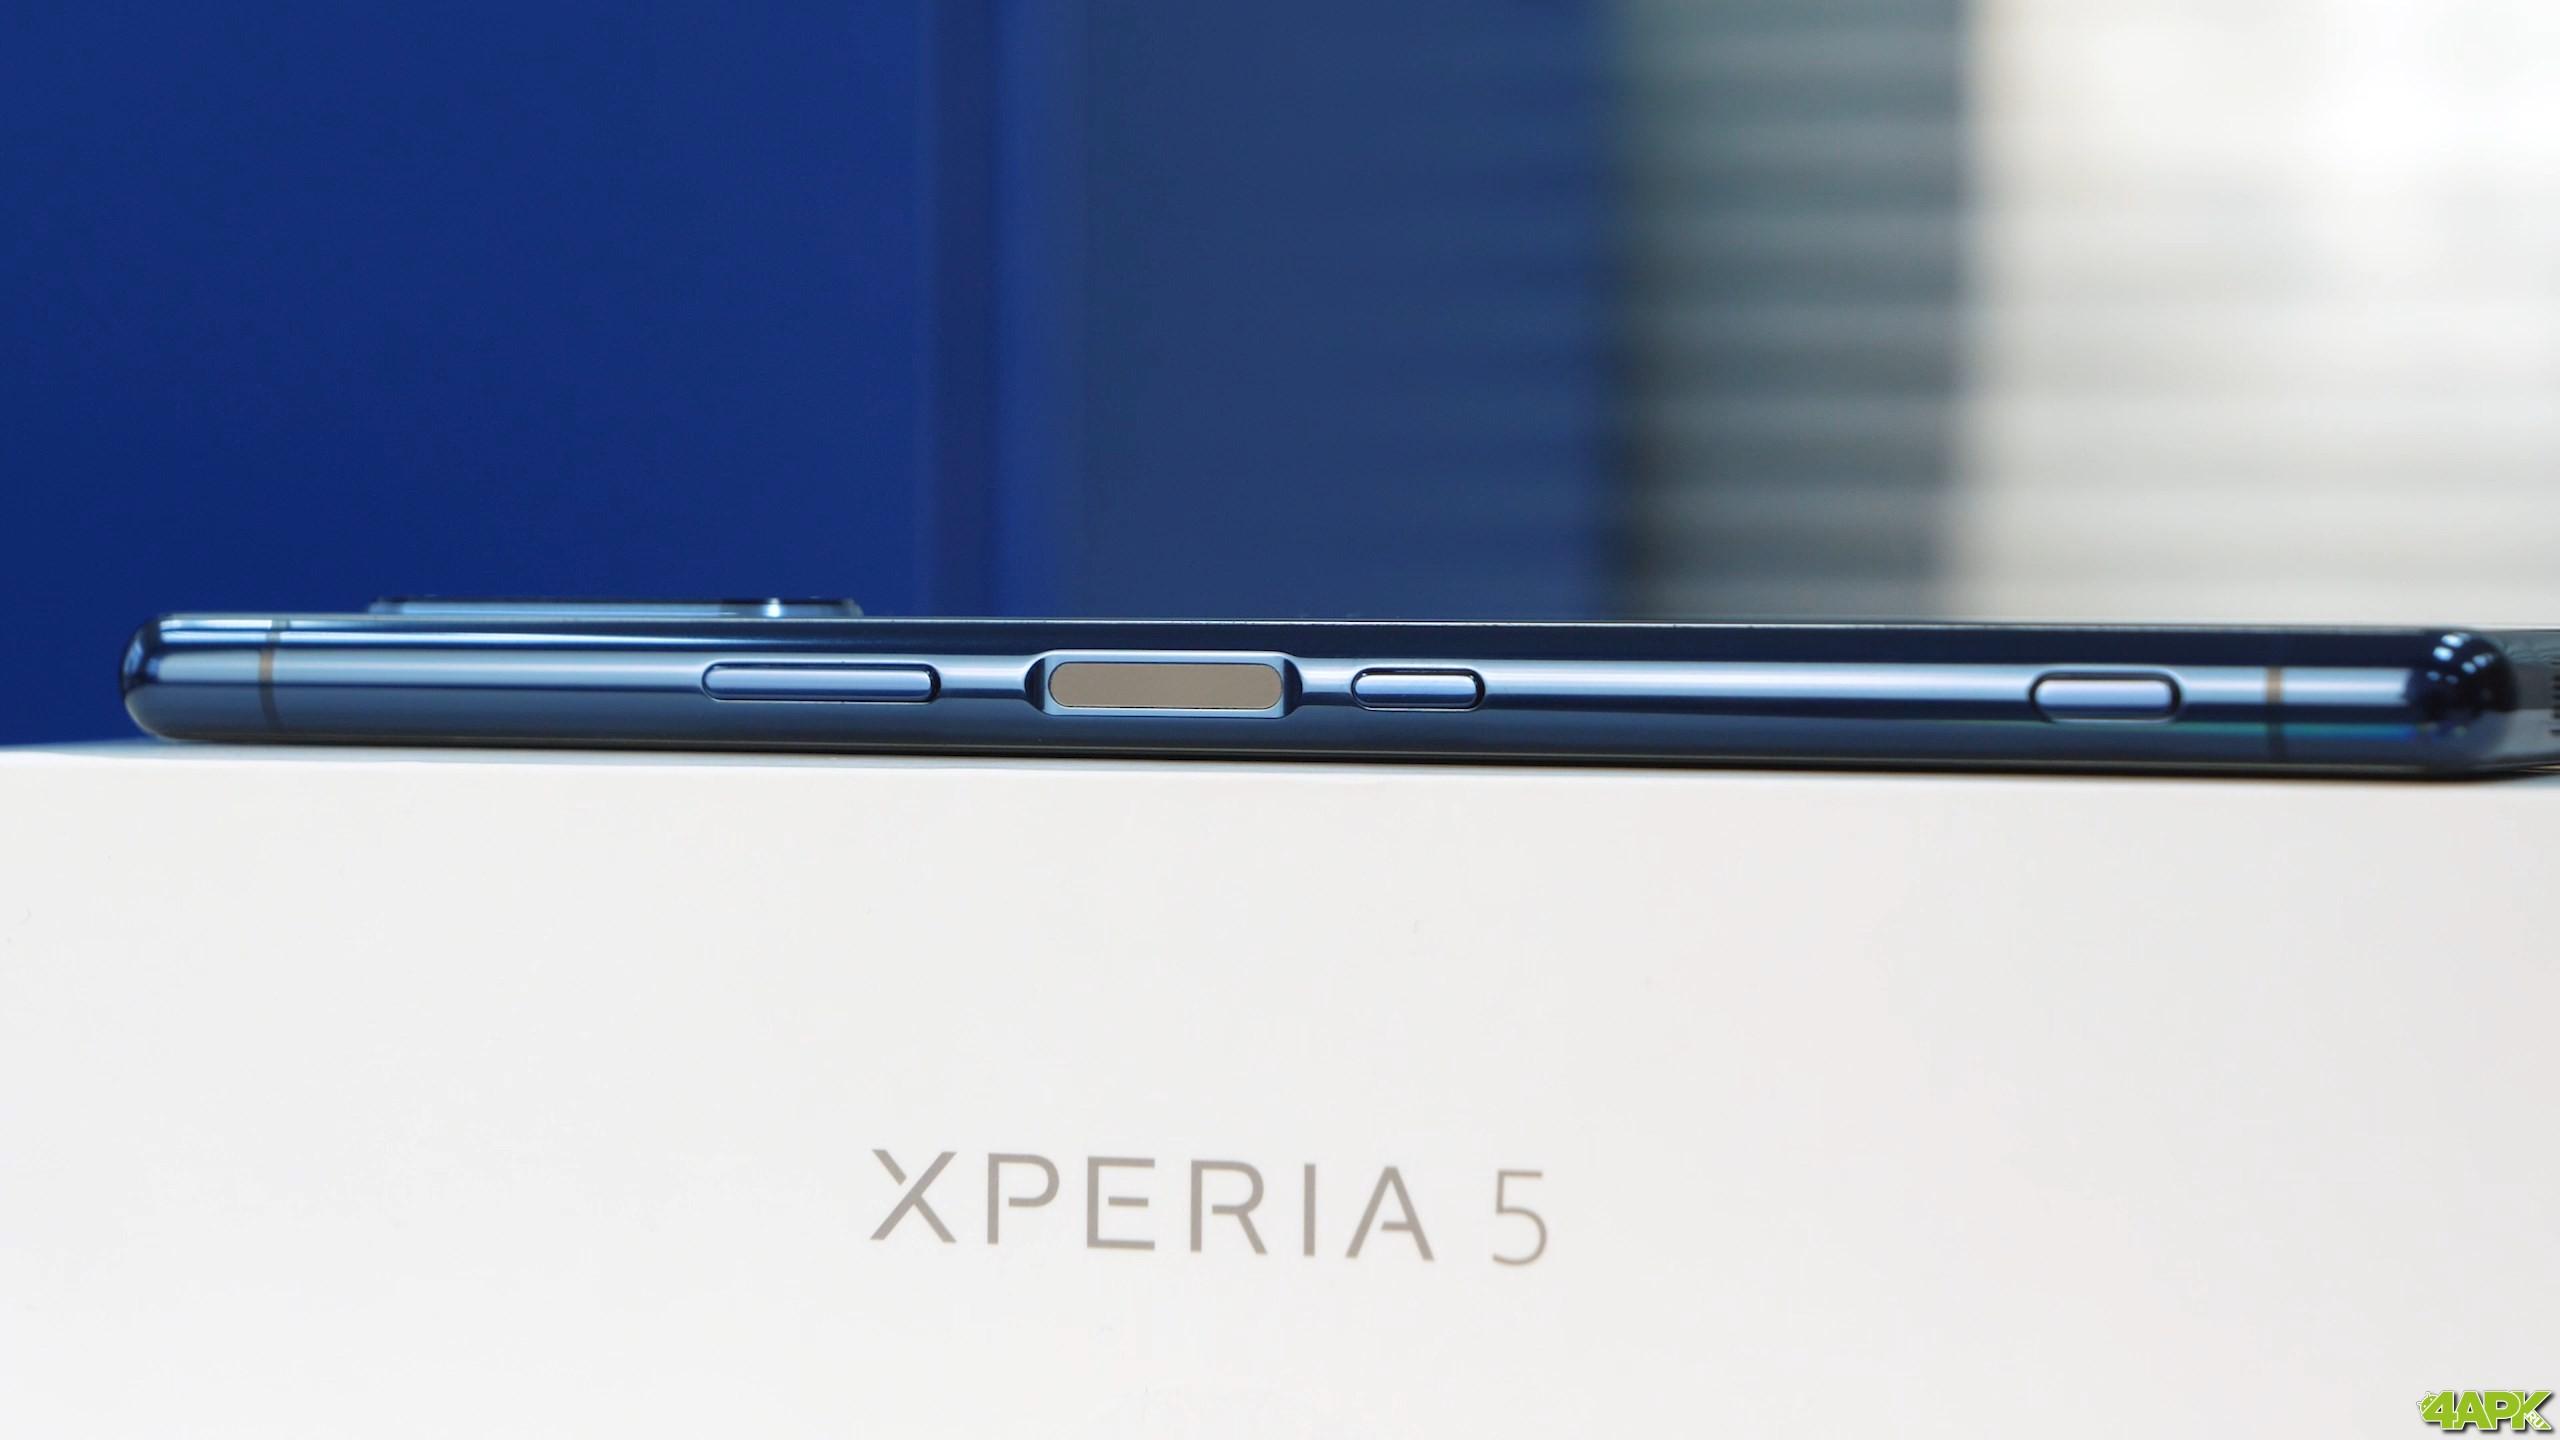 Обзор Sony Xperia 5: компактный смартфон с большим экраном Другие устройства  - obzor_sony_xperia_5_kompakt_s_bolshim_ekranom_picture43_1